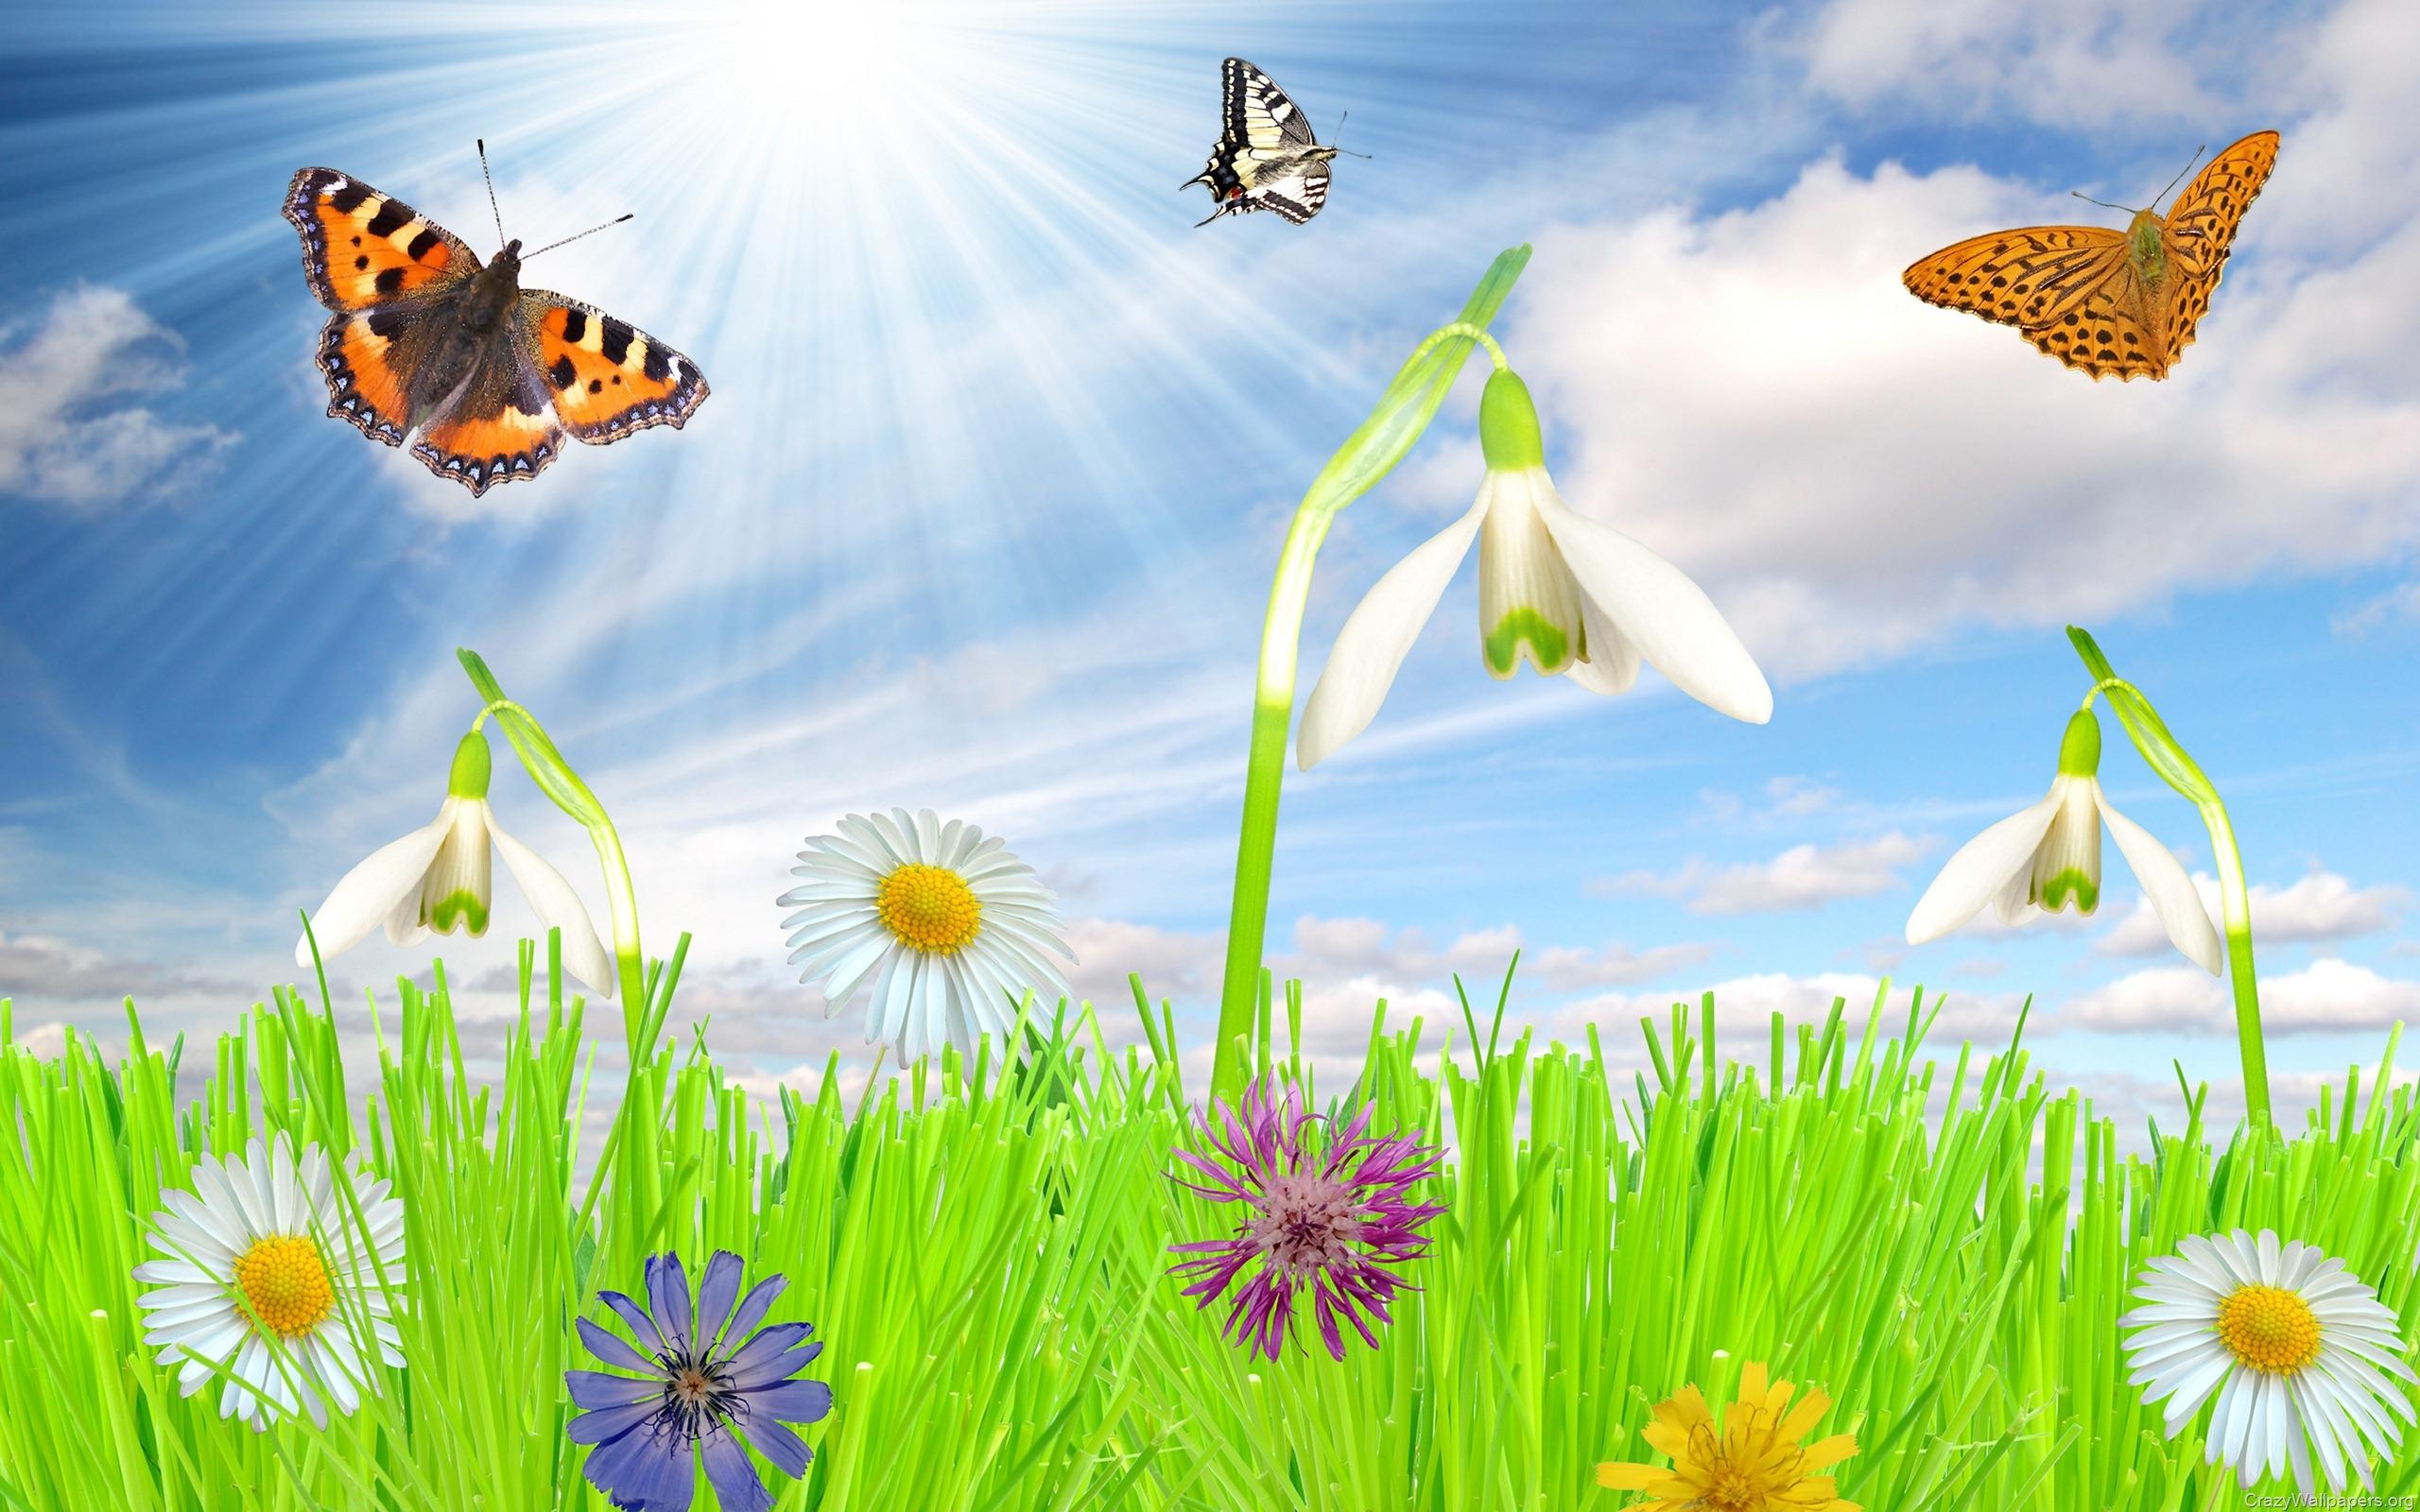 Tags Spring Wallpaper Desktop 2560x1600PX Spring Wallpaper 2560x1600